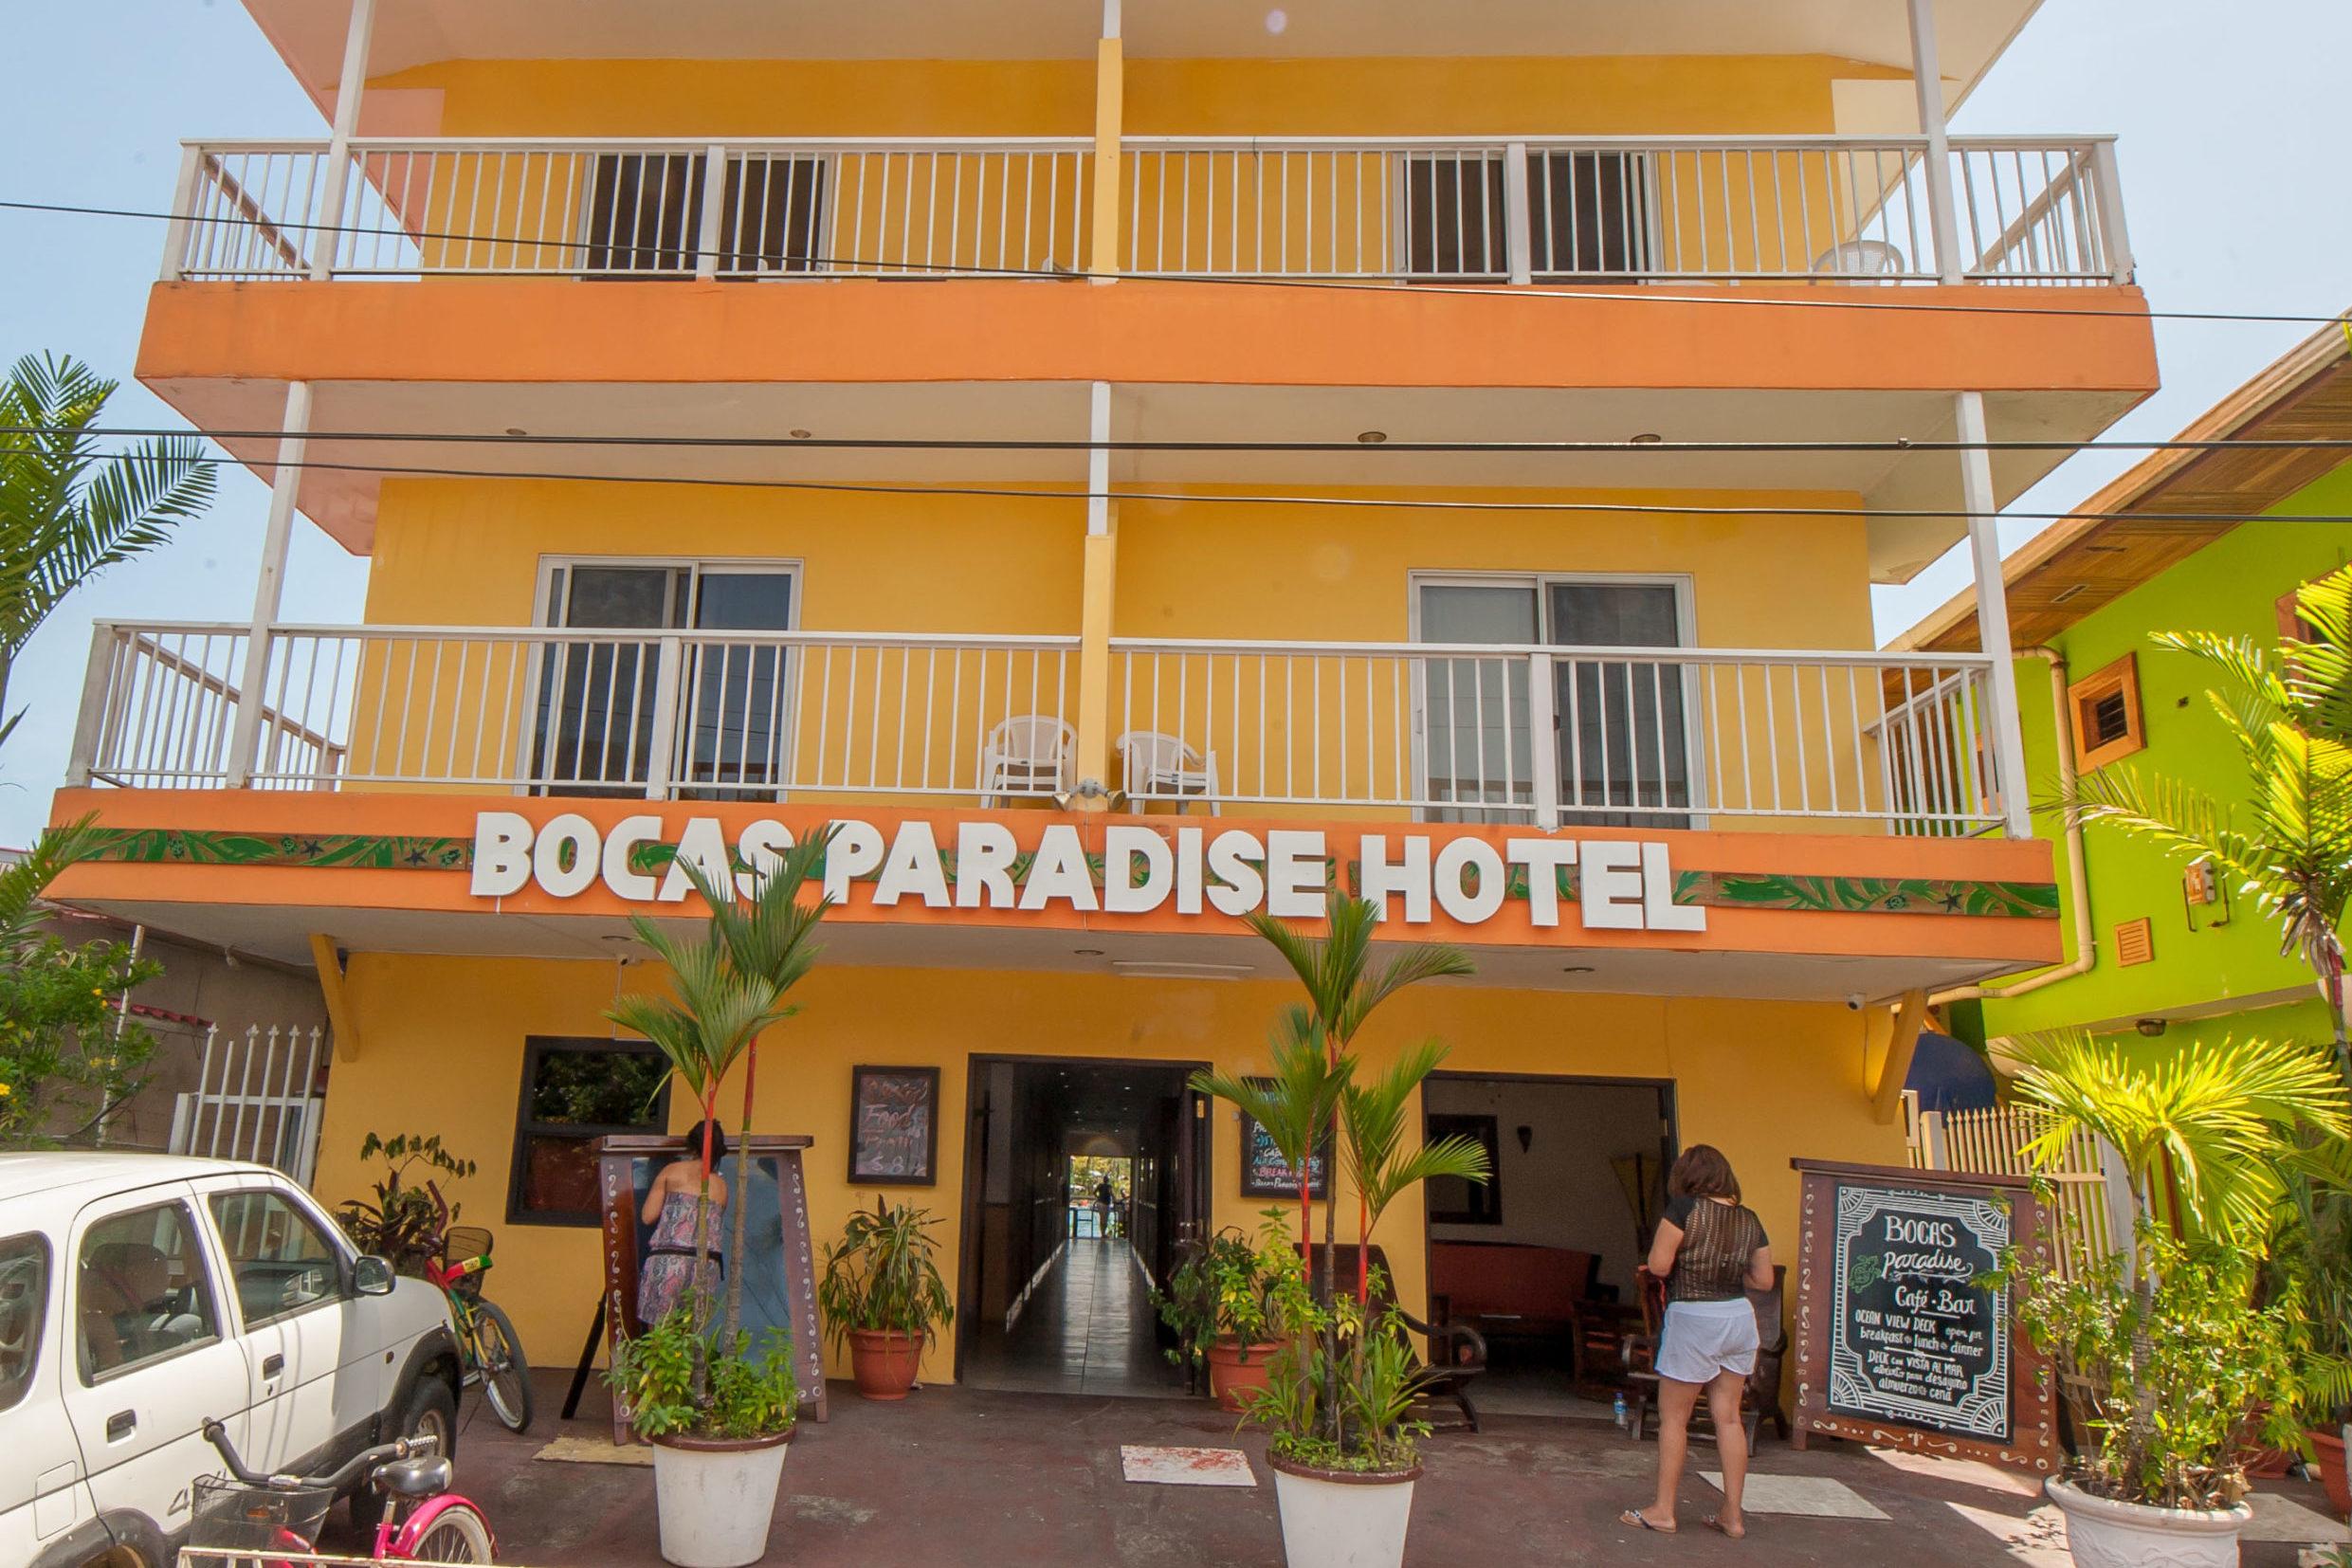 Bocas-paradise-Hotel1